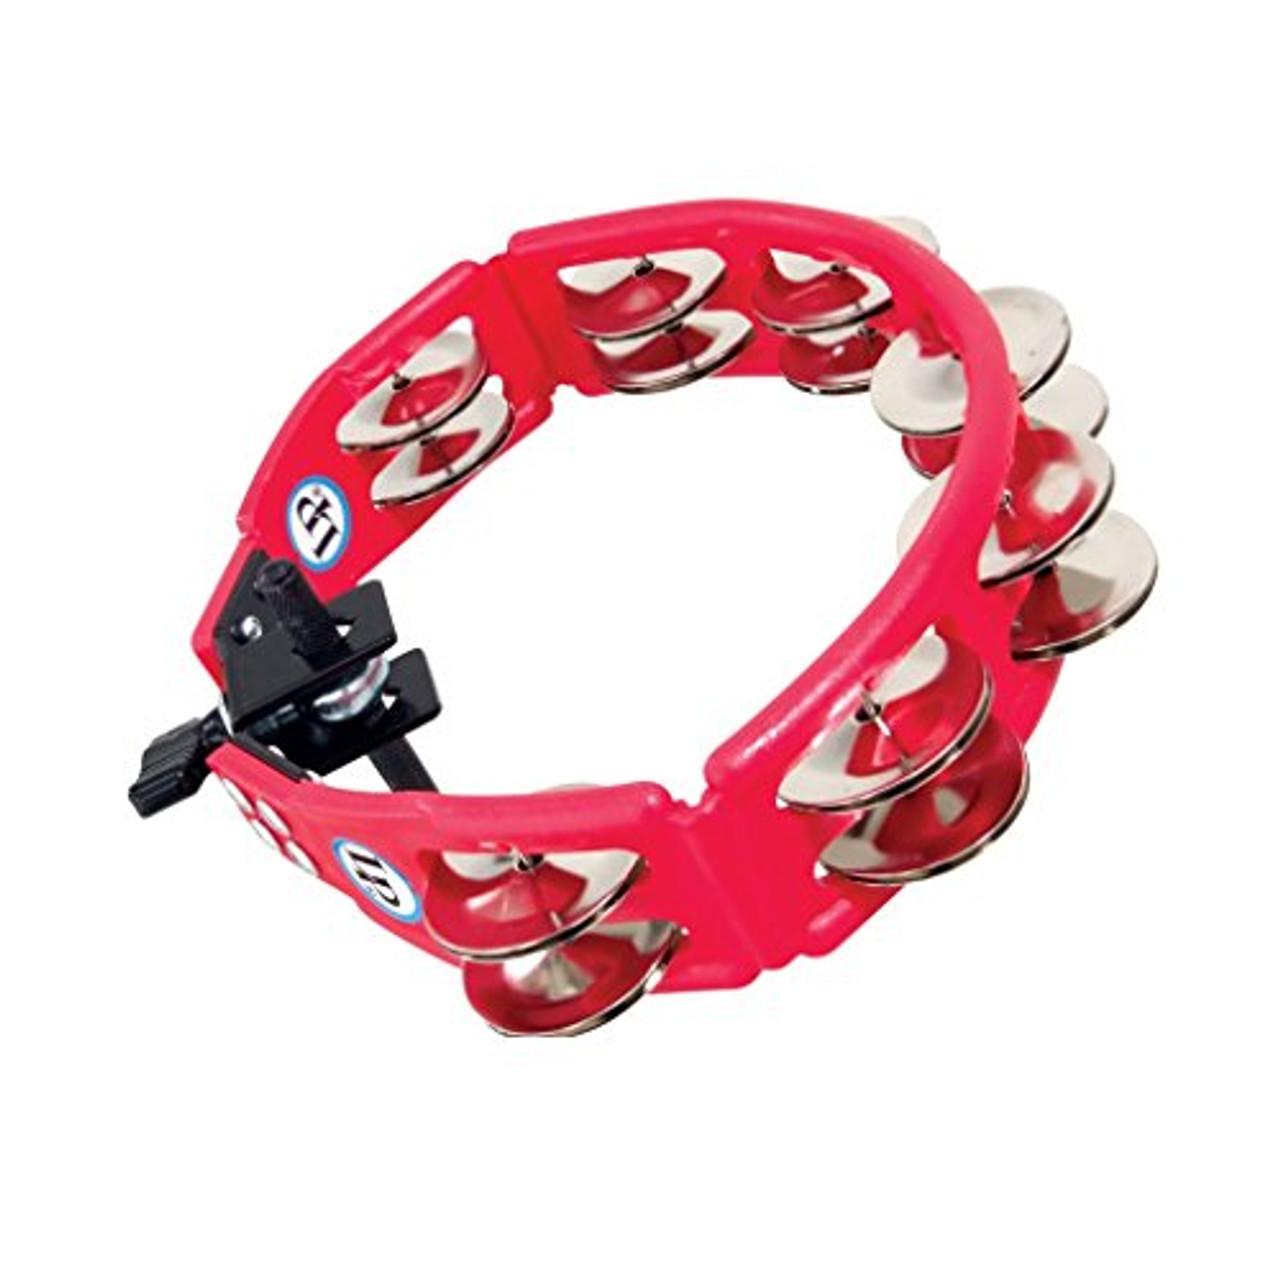 Drum Workshop Cyclops Mounted Tambourine Red Steel